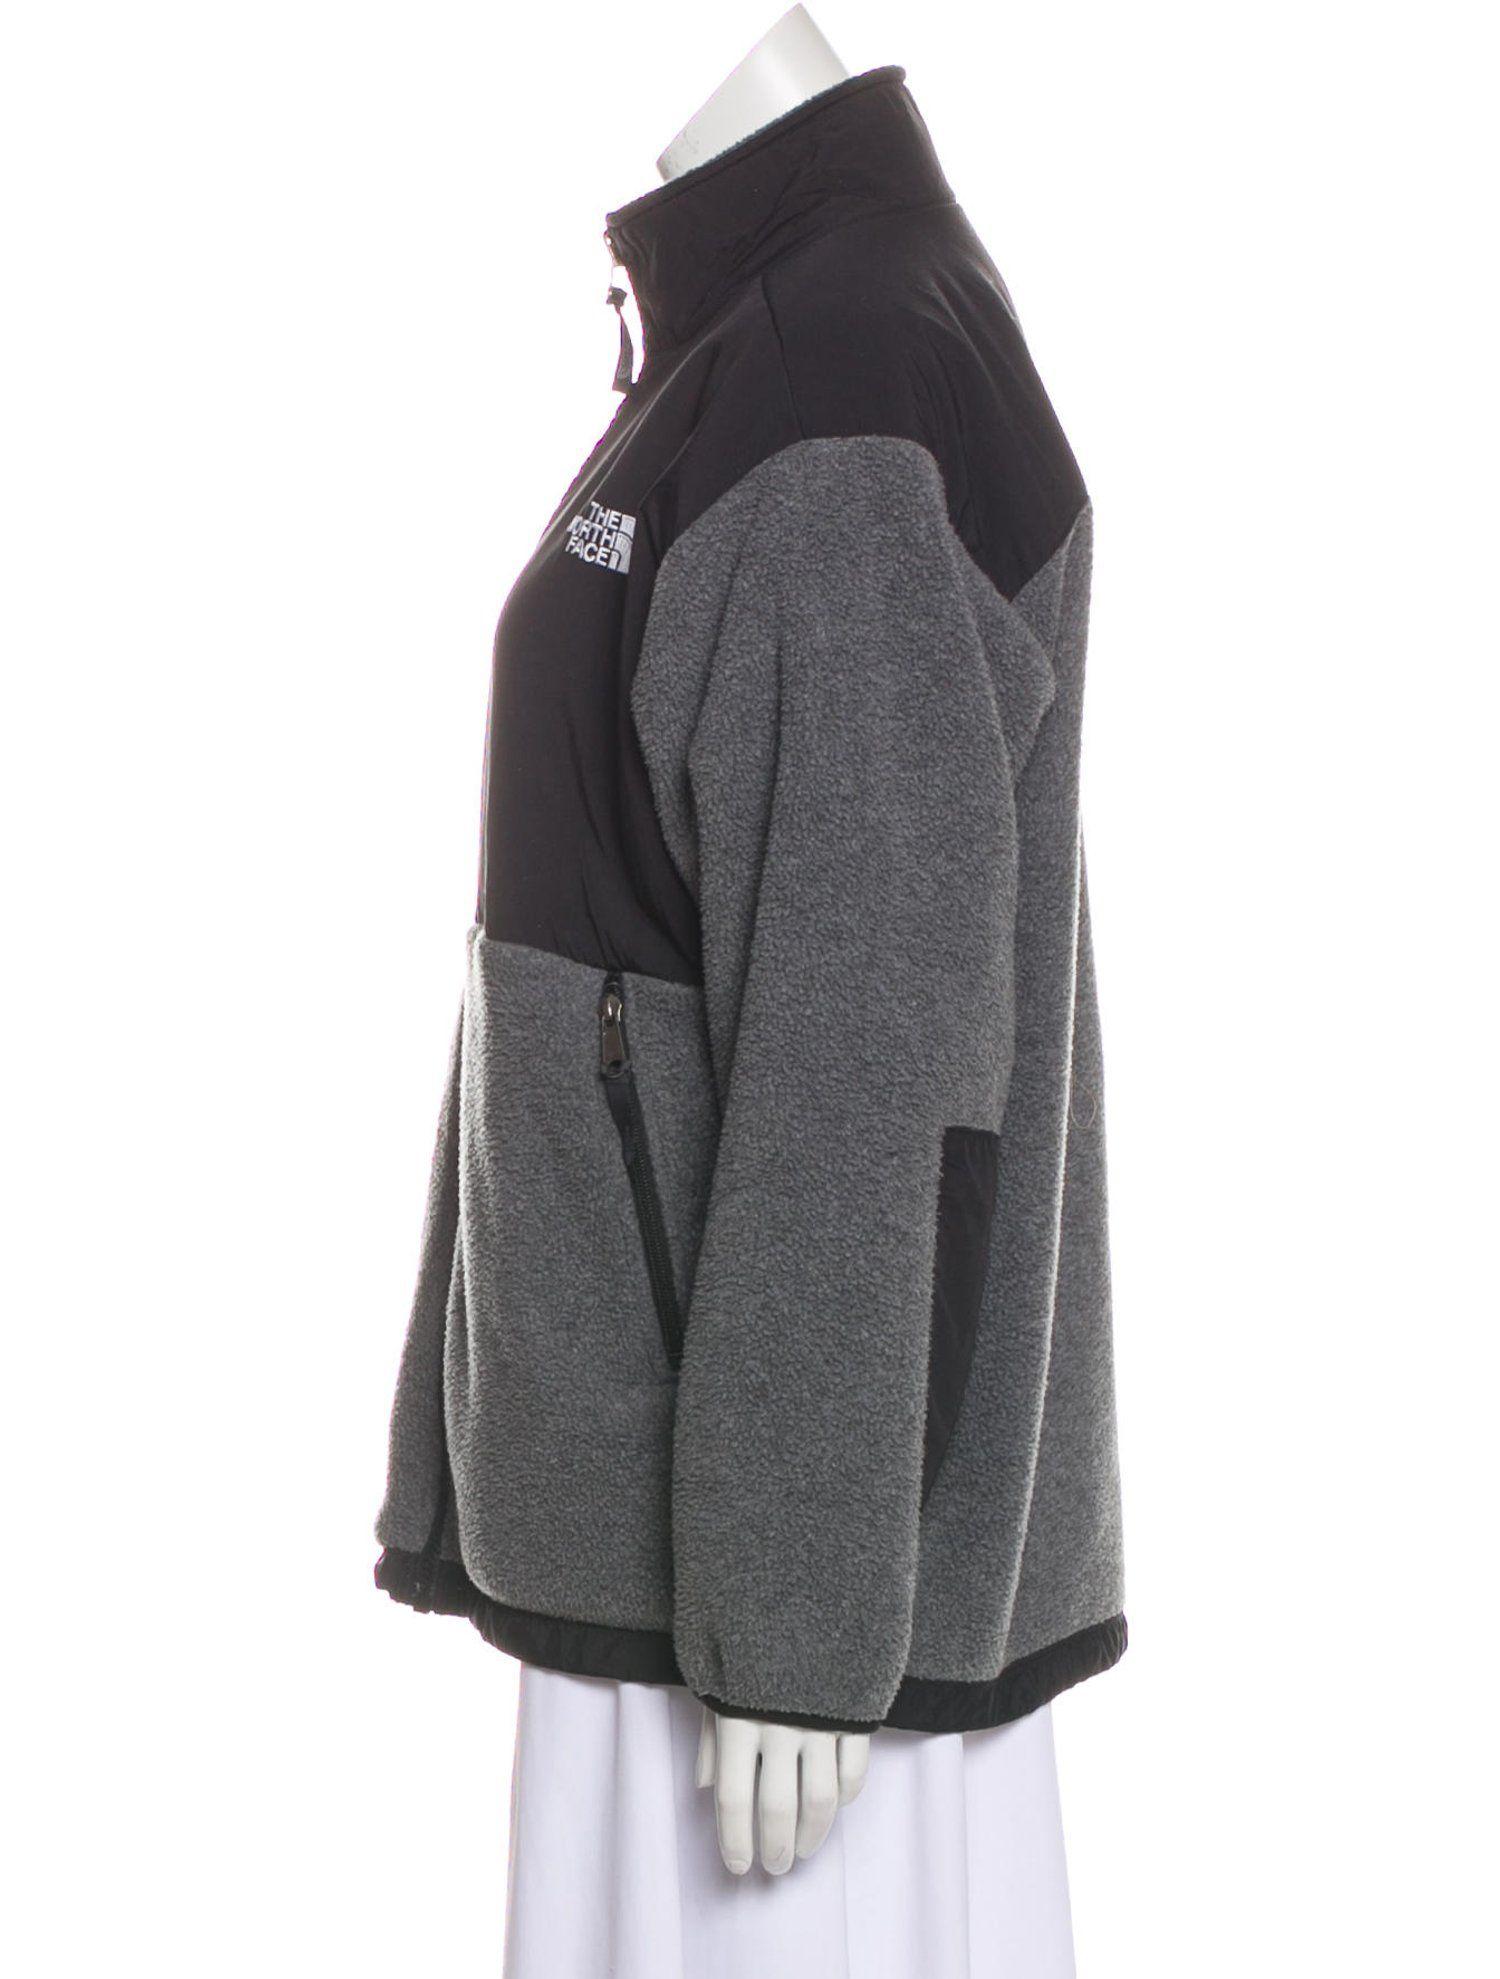 767e004f4 Boys' Zip-Up Fleece Jacket in 2019 | Games | North face fleece ...